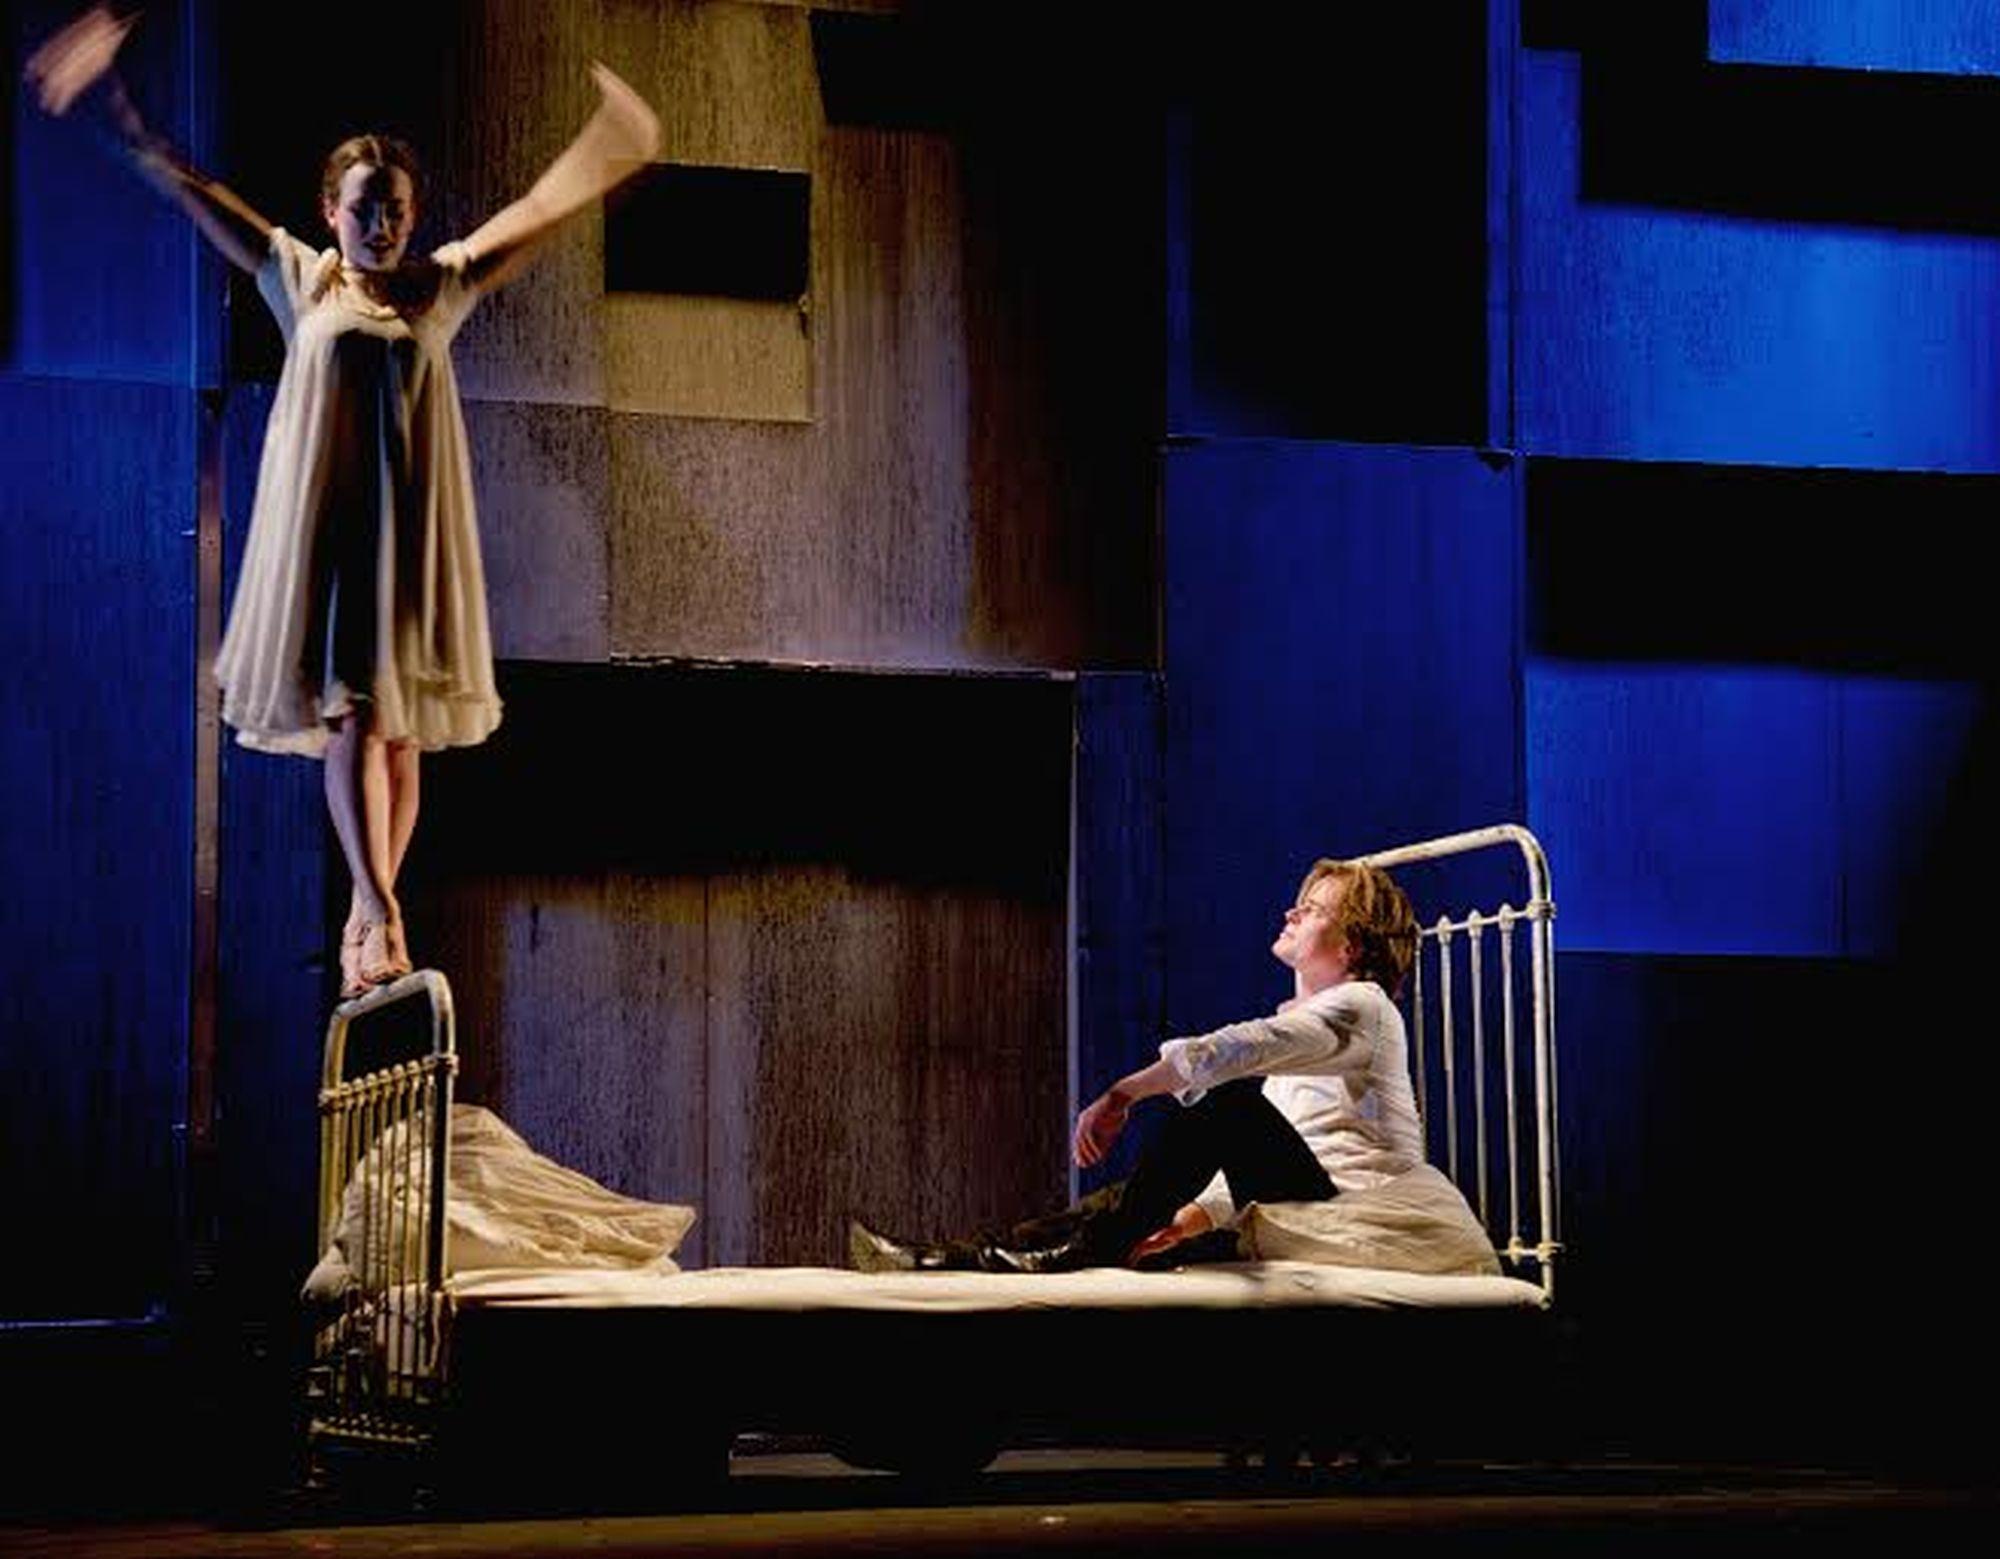 """Hamlet"", fot. S. Normann Hansen, (źródło: materiały prasowe)"